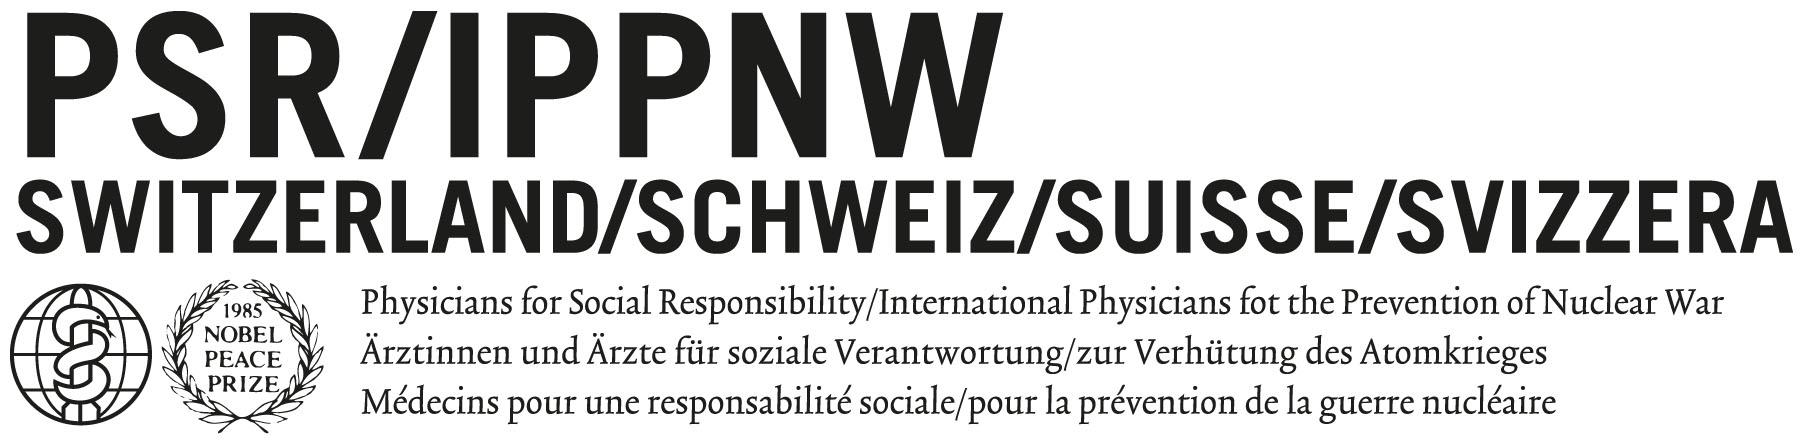 psr_logo, jpg.jpg